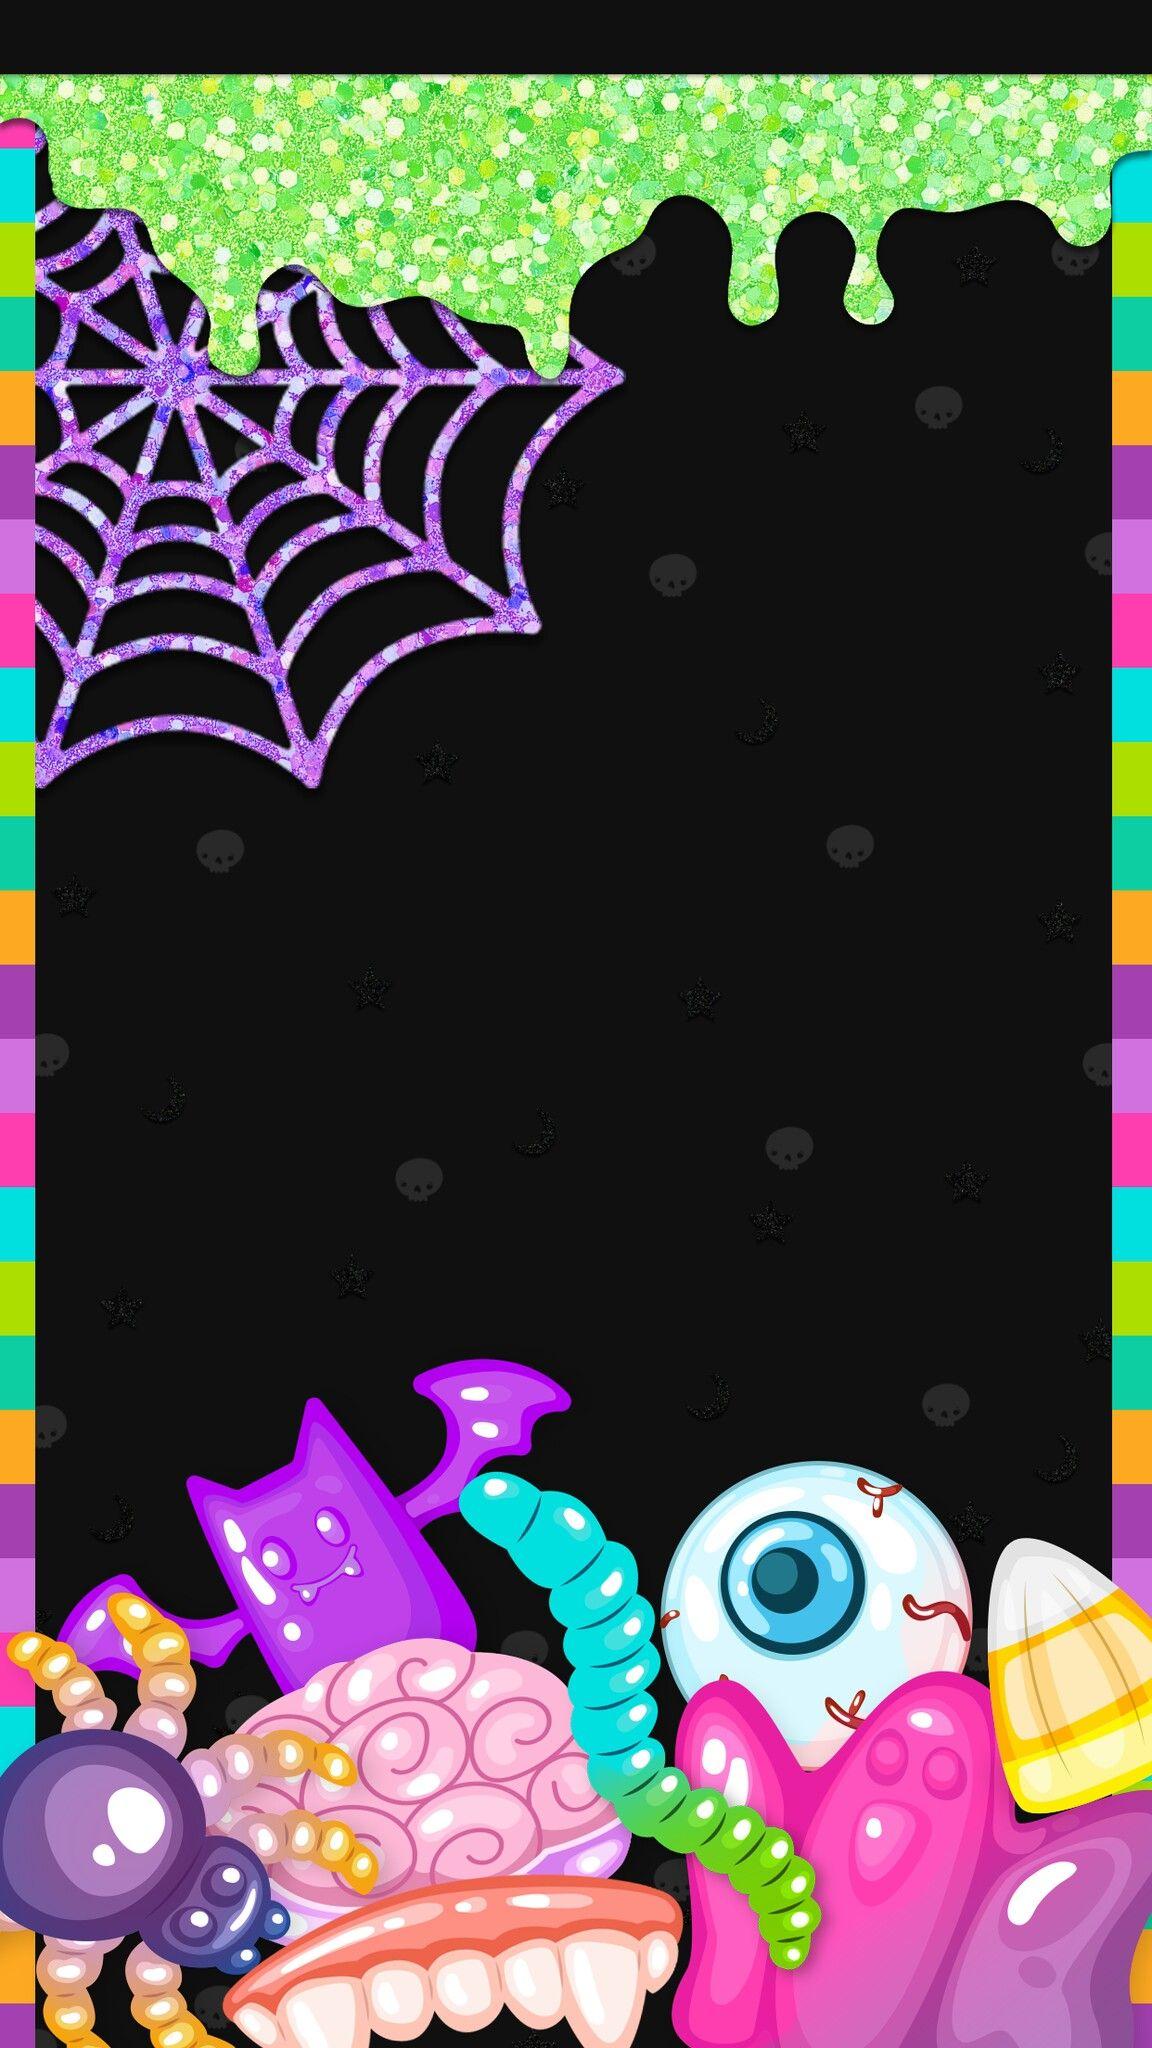 Beautiful Wallpaper Halloween Hello Kitty - edafa76b0f47d2371e22393cd78fcf92  Perfect Image Reference_503636.jpg